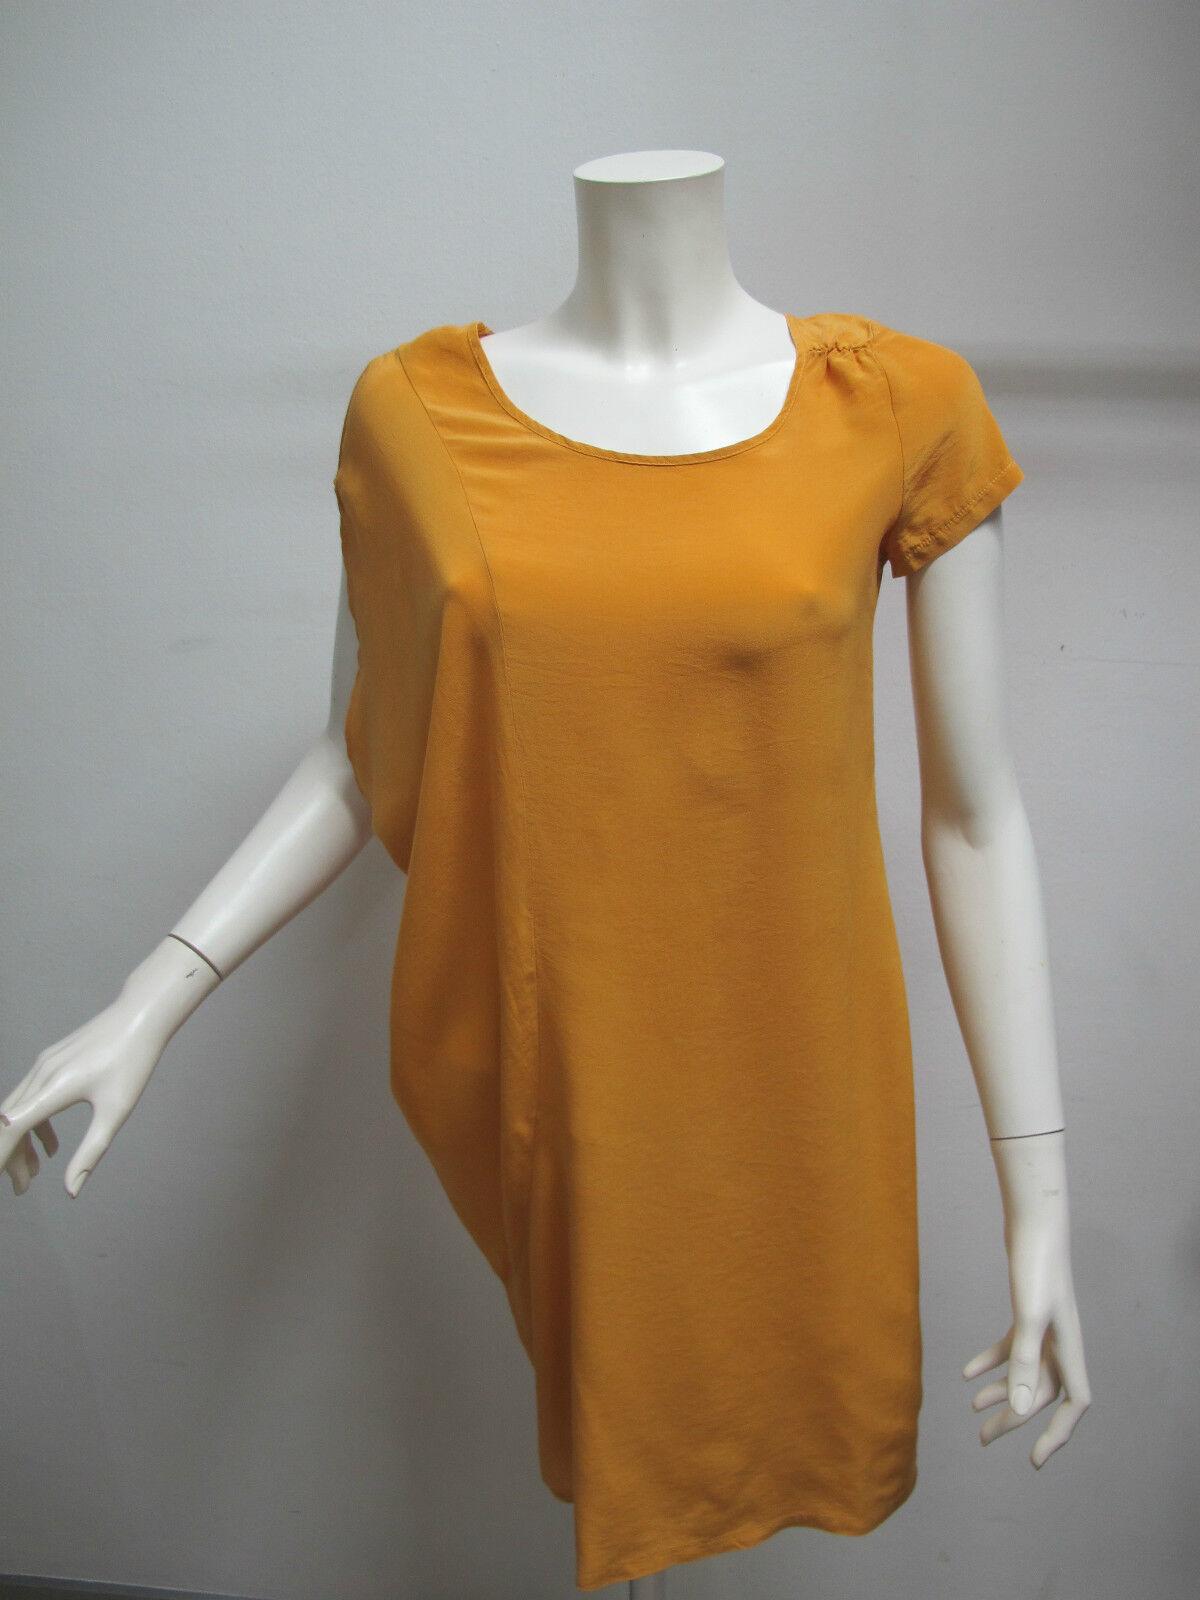 OTTOD'AME women's dress mod.HA2113 col. yellow size 48 summer 2012